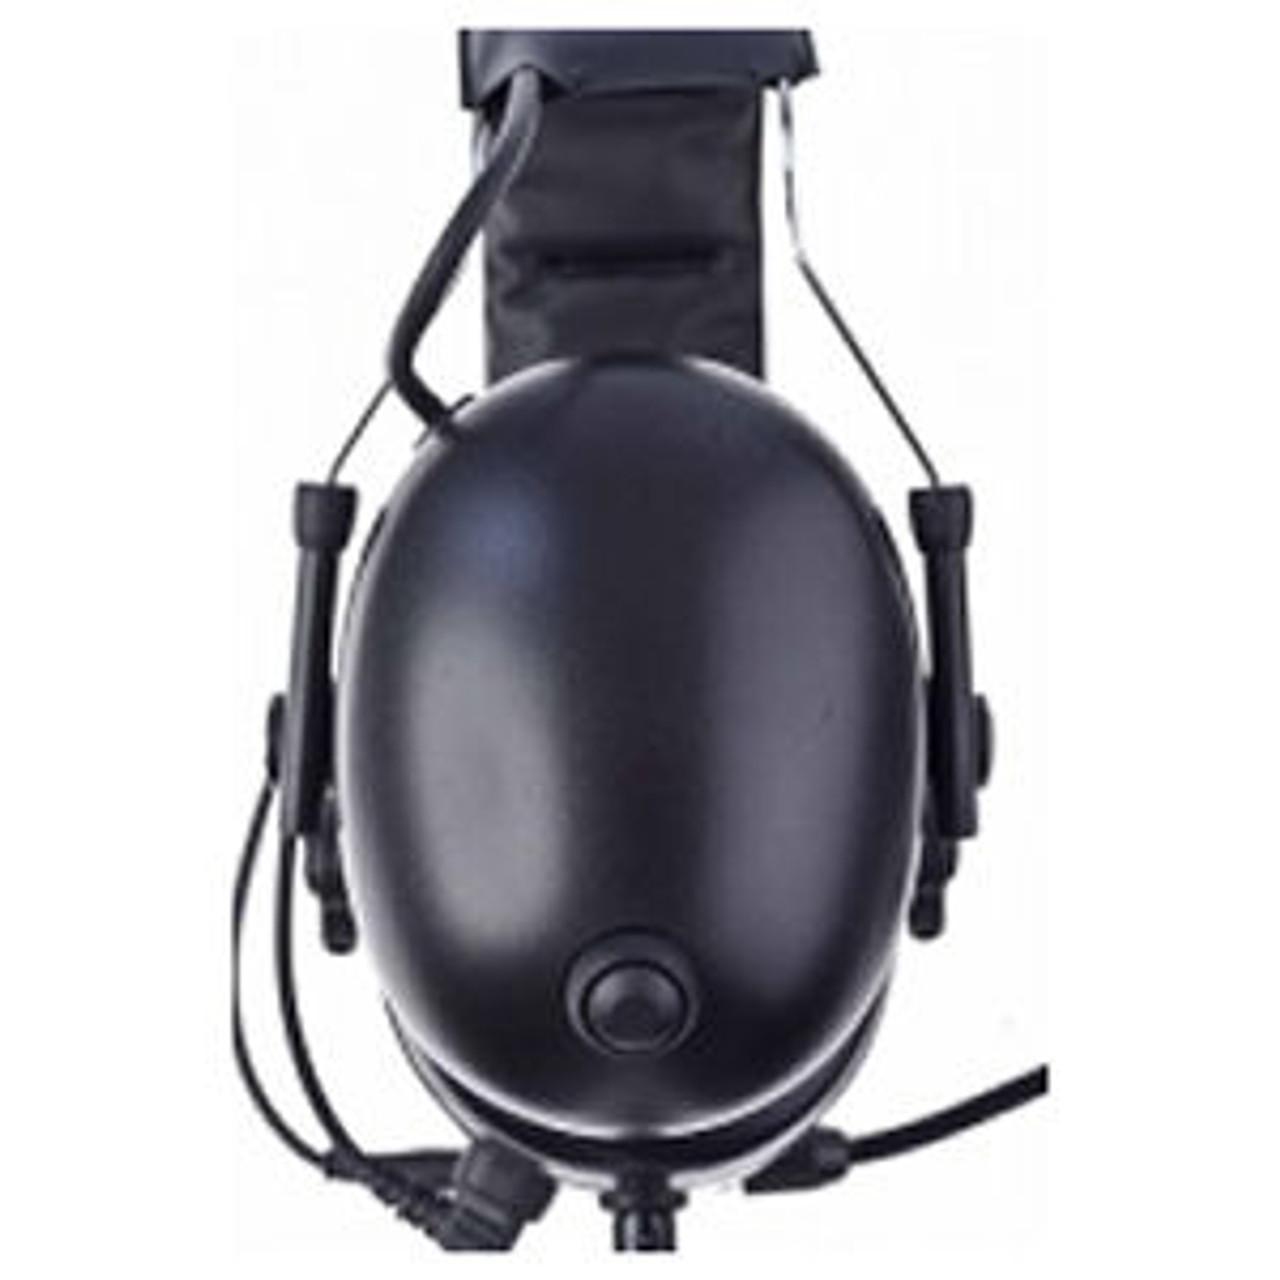 Bendix King EPH Over The Head Double Muff Headset